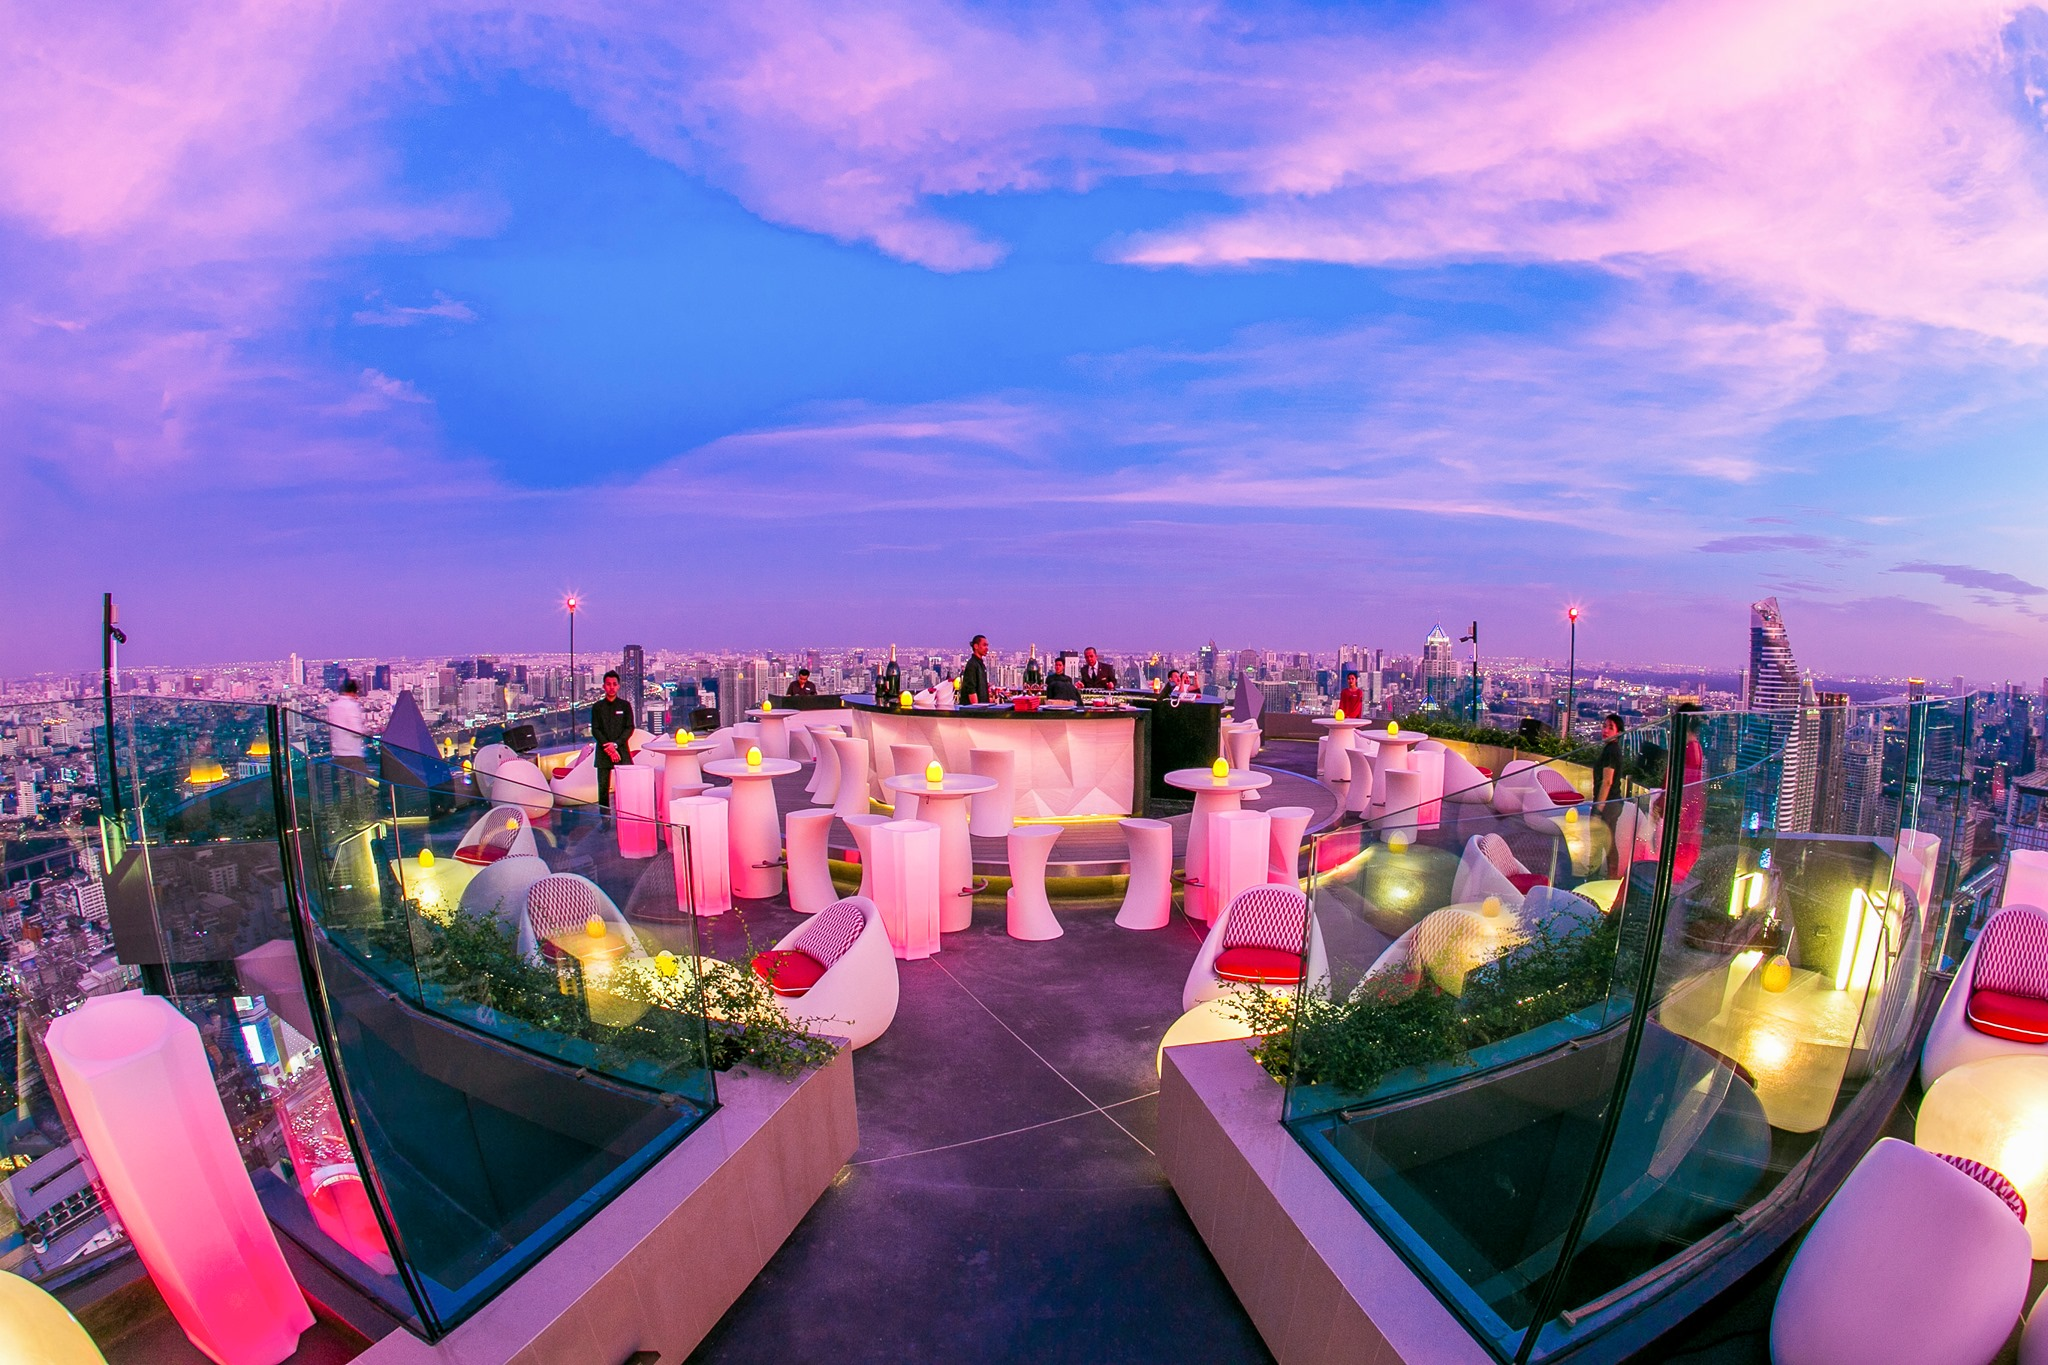 Best Rooftop Bar Bangkok, rooftop bar bangkok, sky bar bangkok, sky bar, bangkok bars, bangkok rooftop places, best rooftop bars in bangkok, top rooftop bars, bangkok best sky bars, sky bars, popular rooftop bars, new rooftop bars bangkok, best speakeasies bangkok, CRU, CRU Champagne Bar, CRU Champagne rooftop,